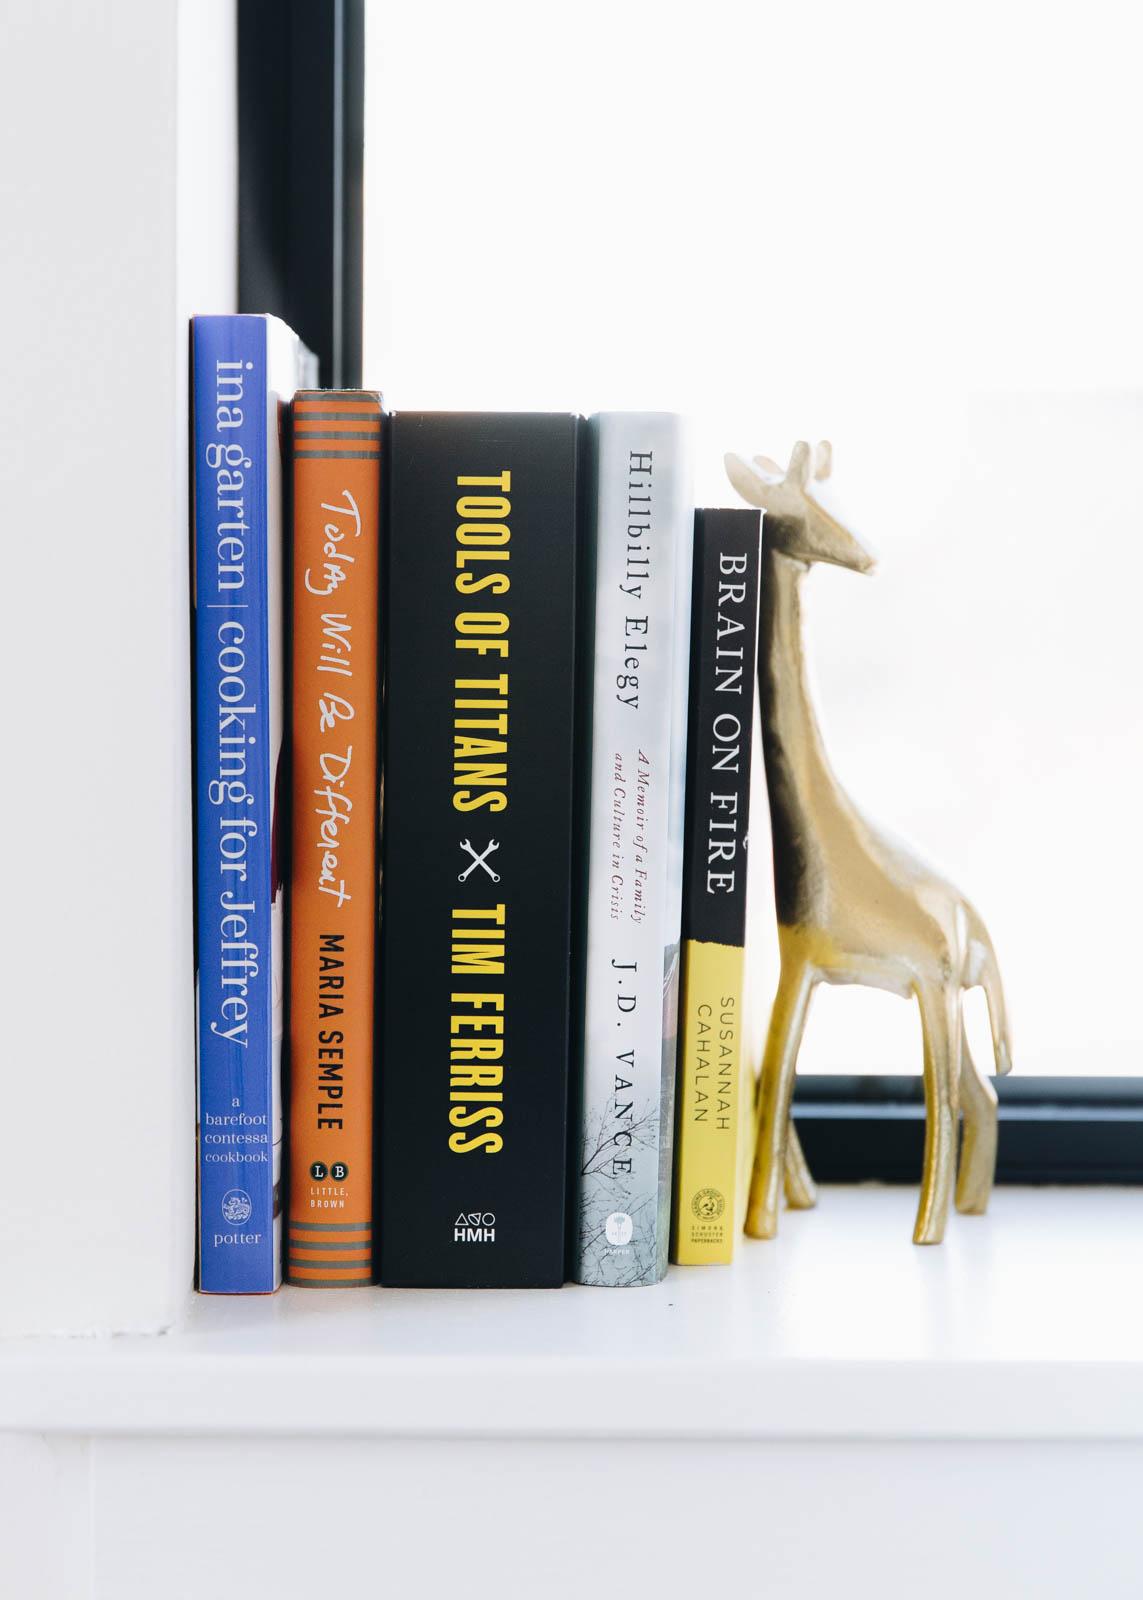 books on window sill